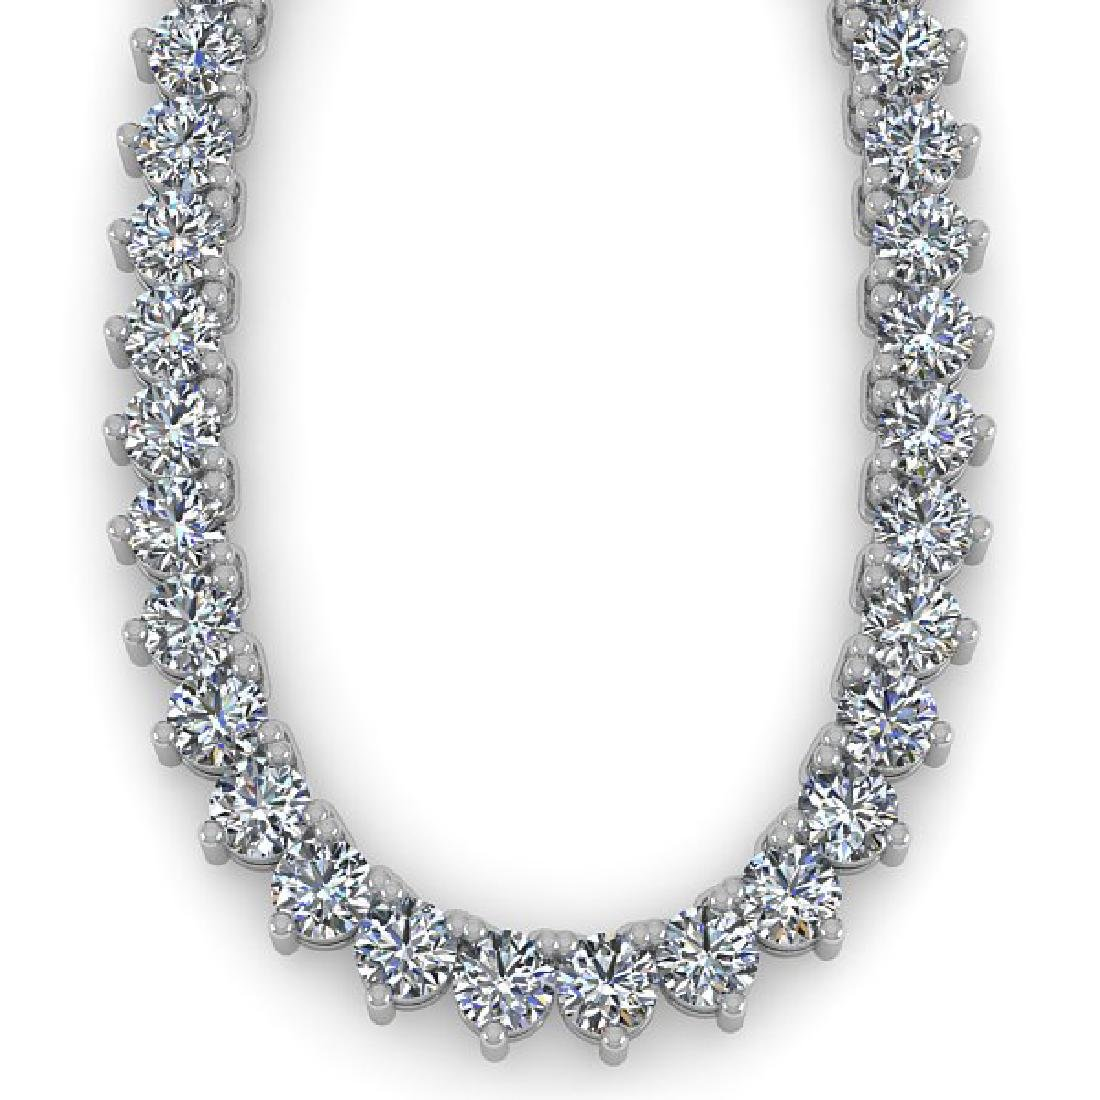 20 CTW Solitaire VS/SI Diamond Necklace 18K White Gold - 2